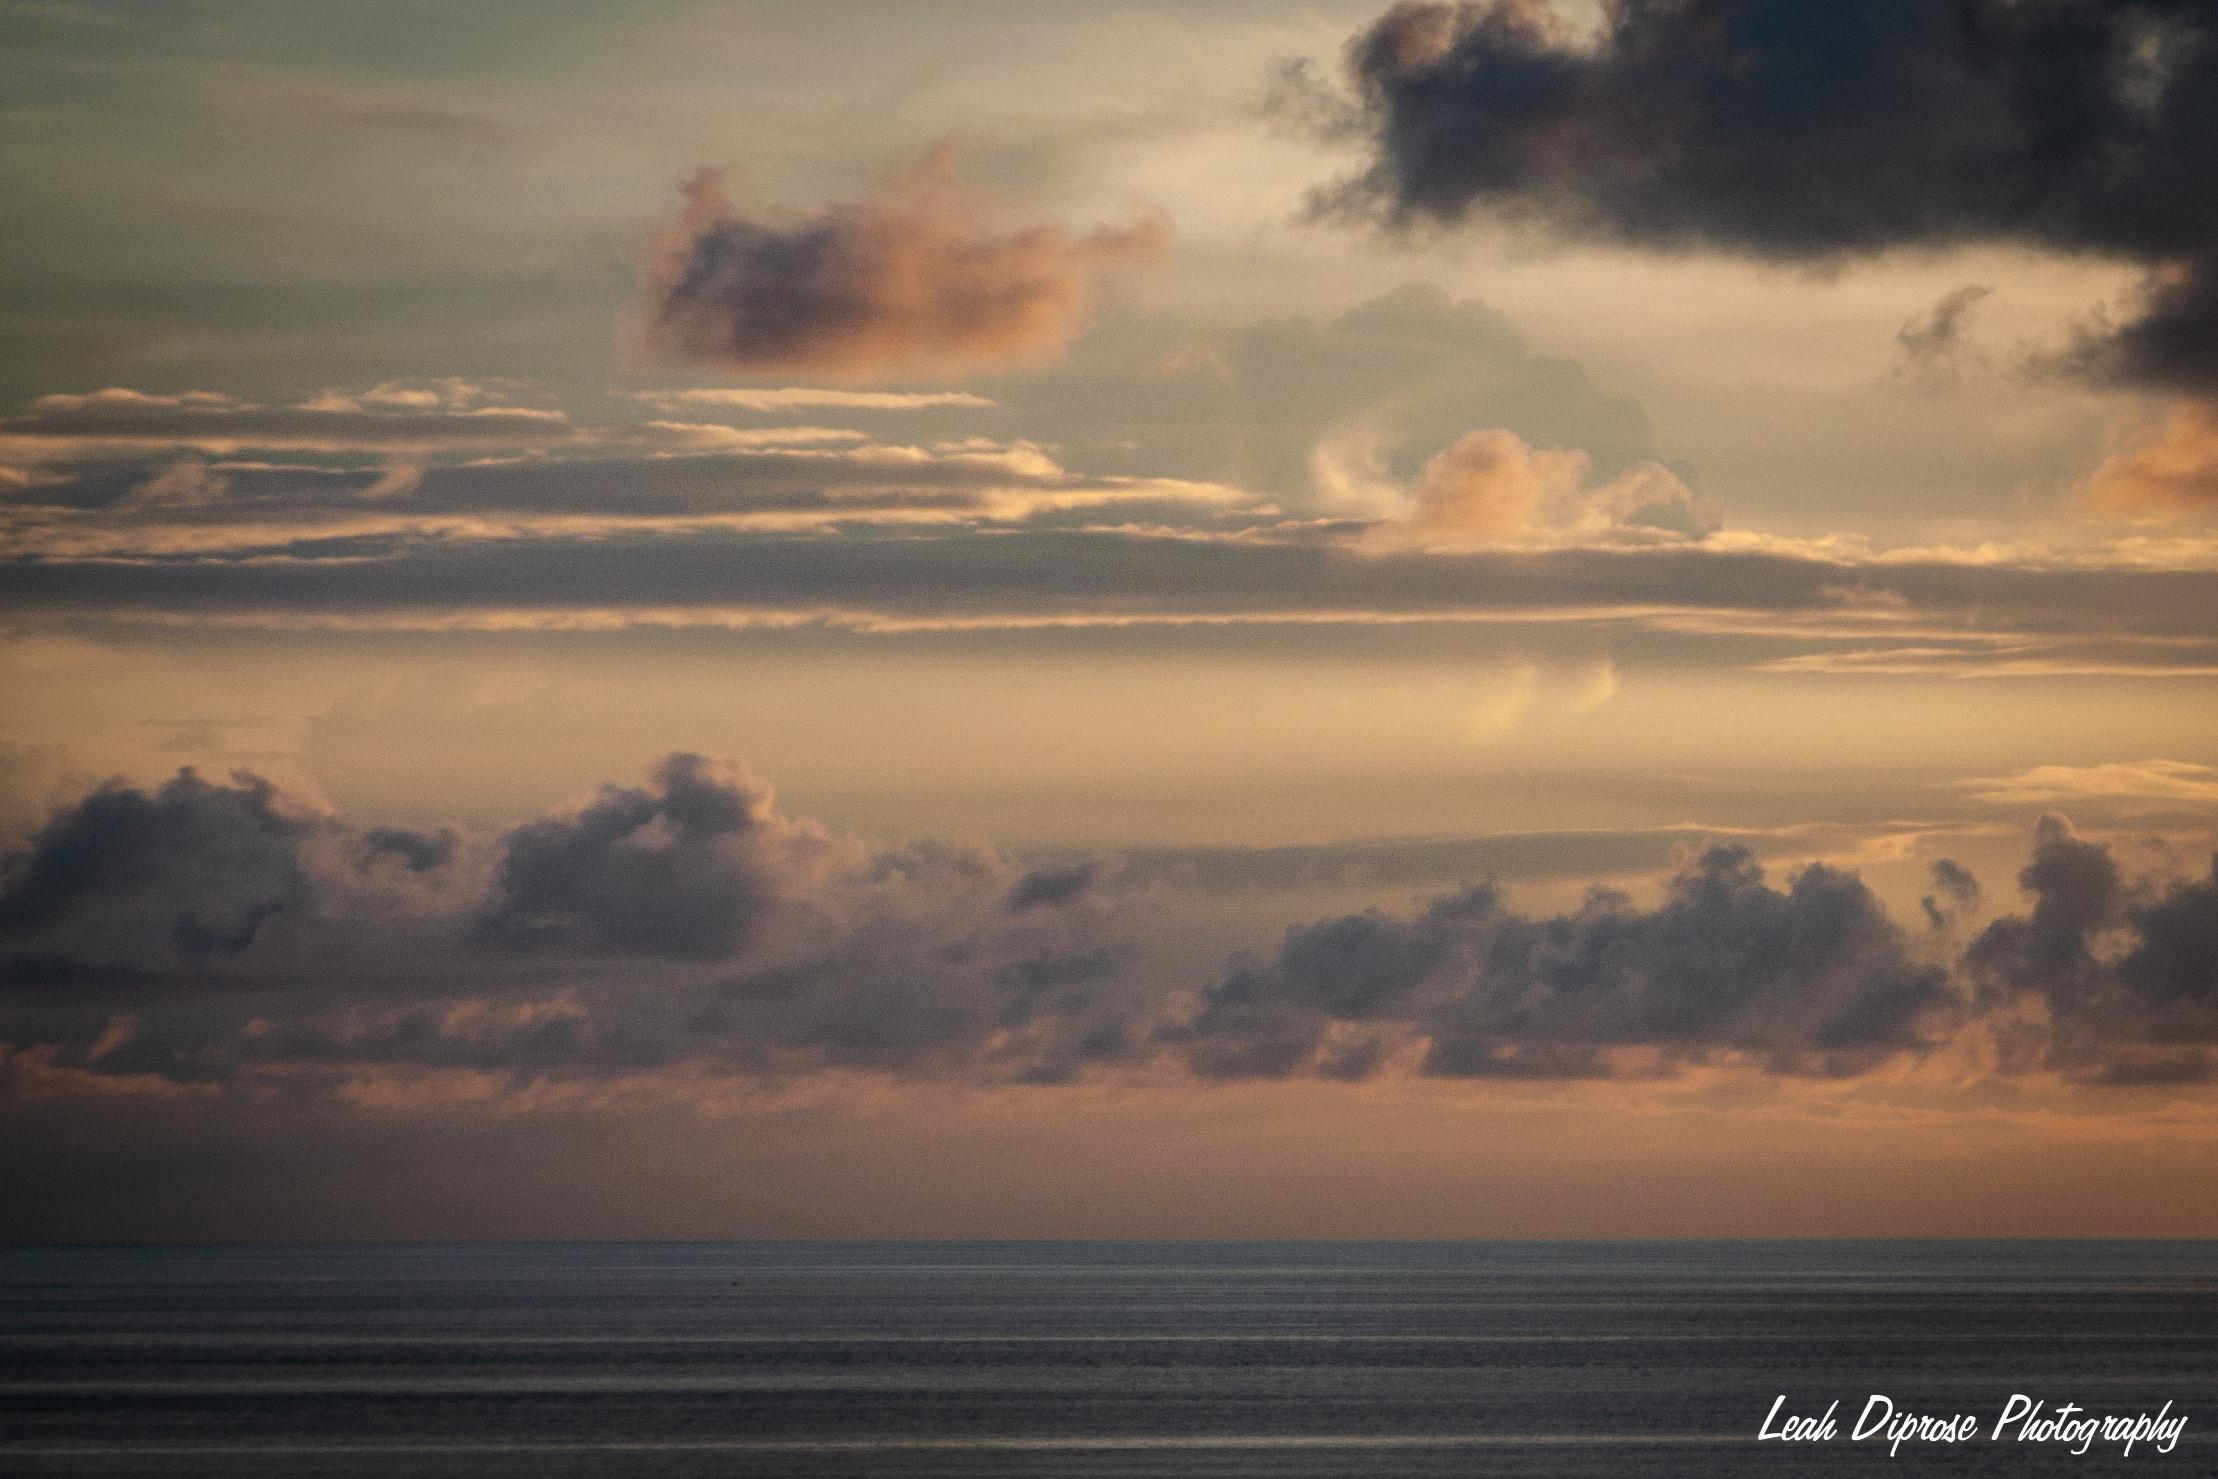 Leah Diprose Photography image-7353.jpg